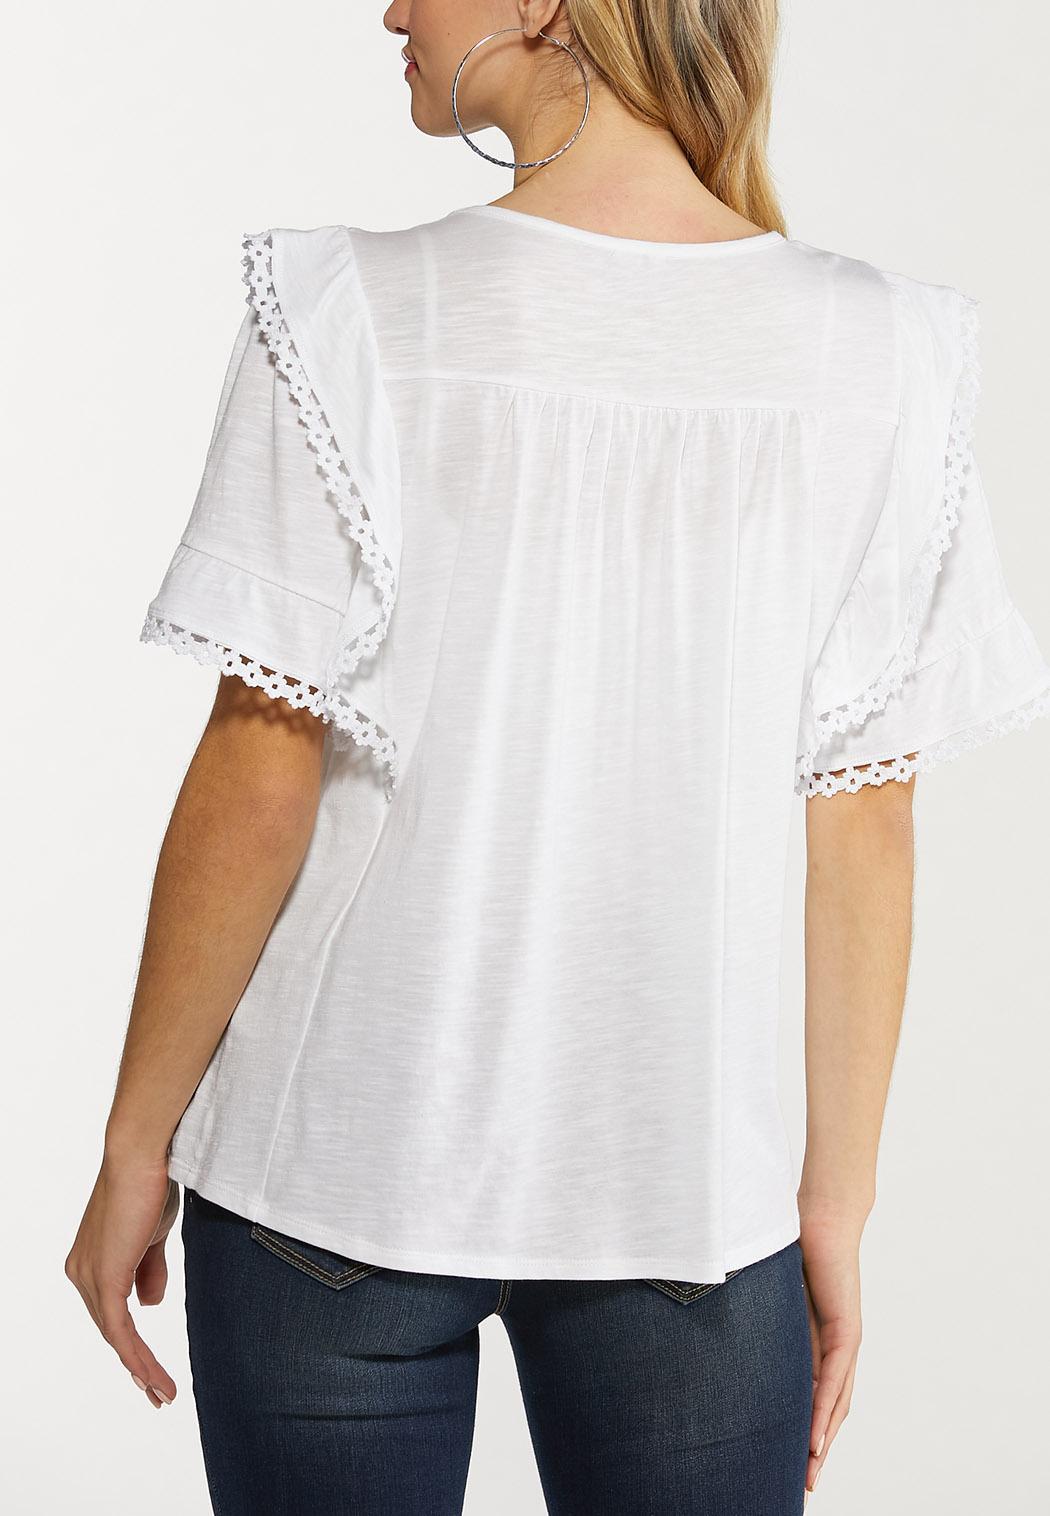 Plus Size Ruffled Flutter Lace Top (Item #44517524)